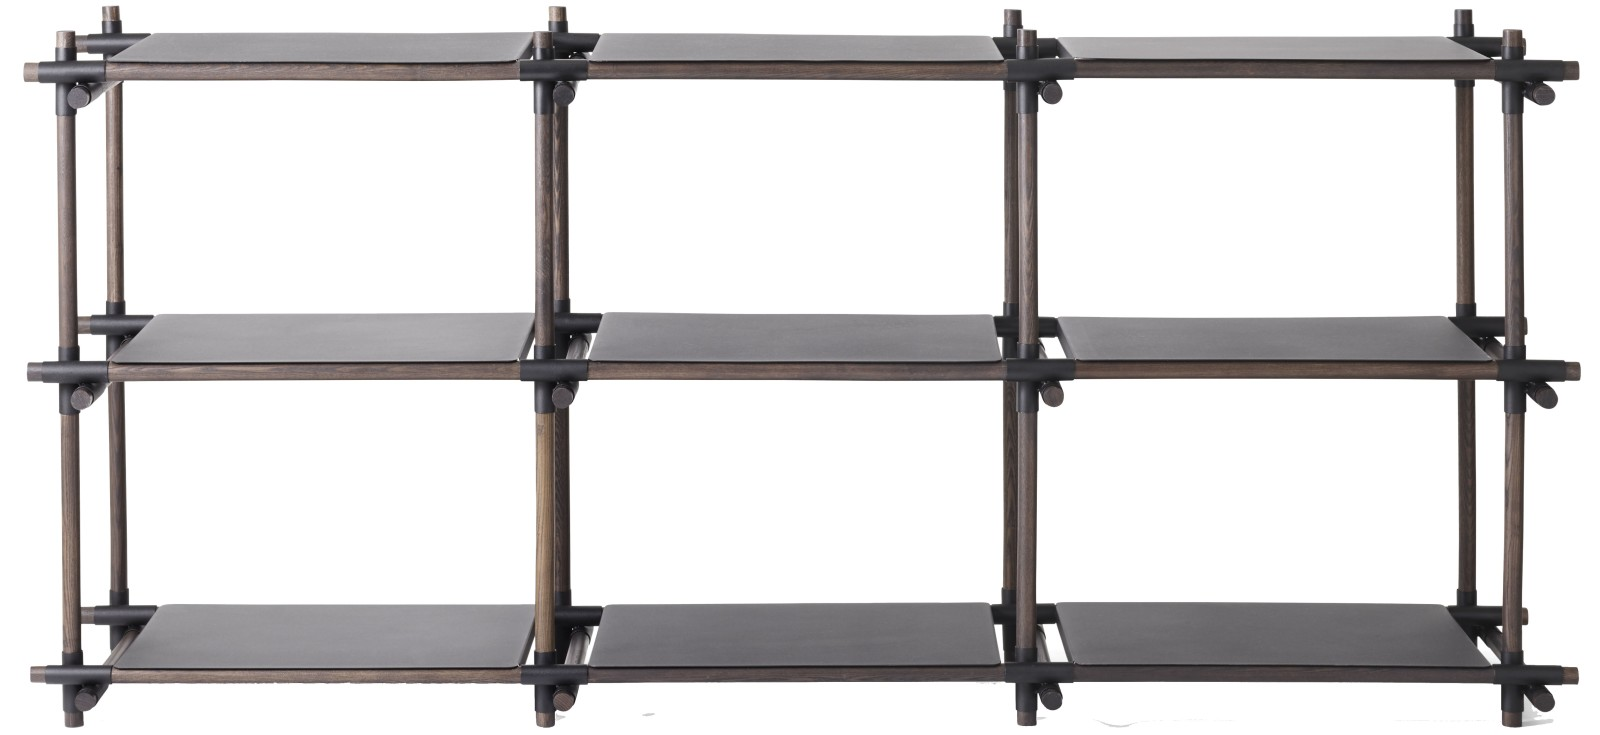 Stick System Shelving, 3x3 Black